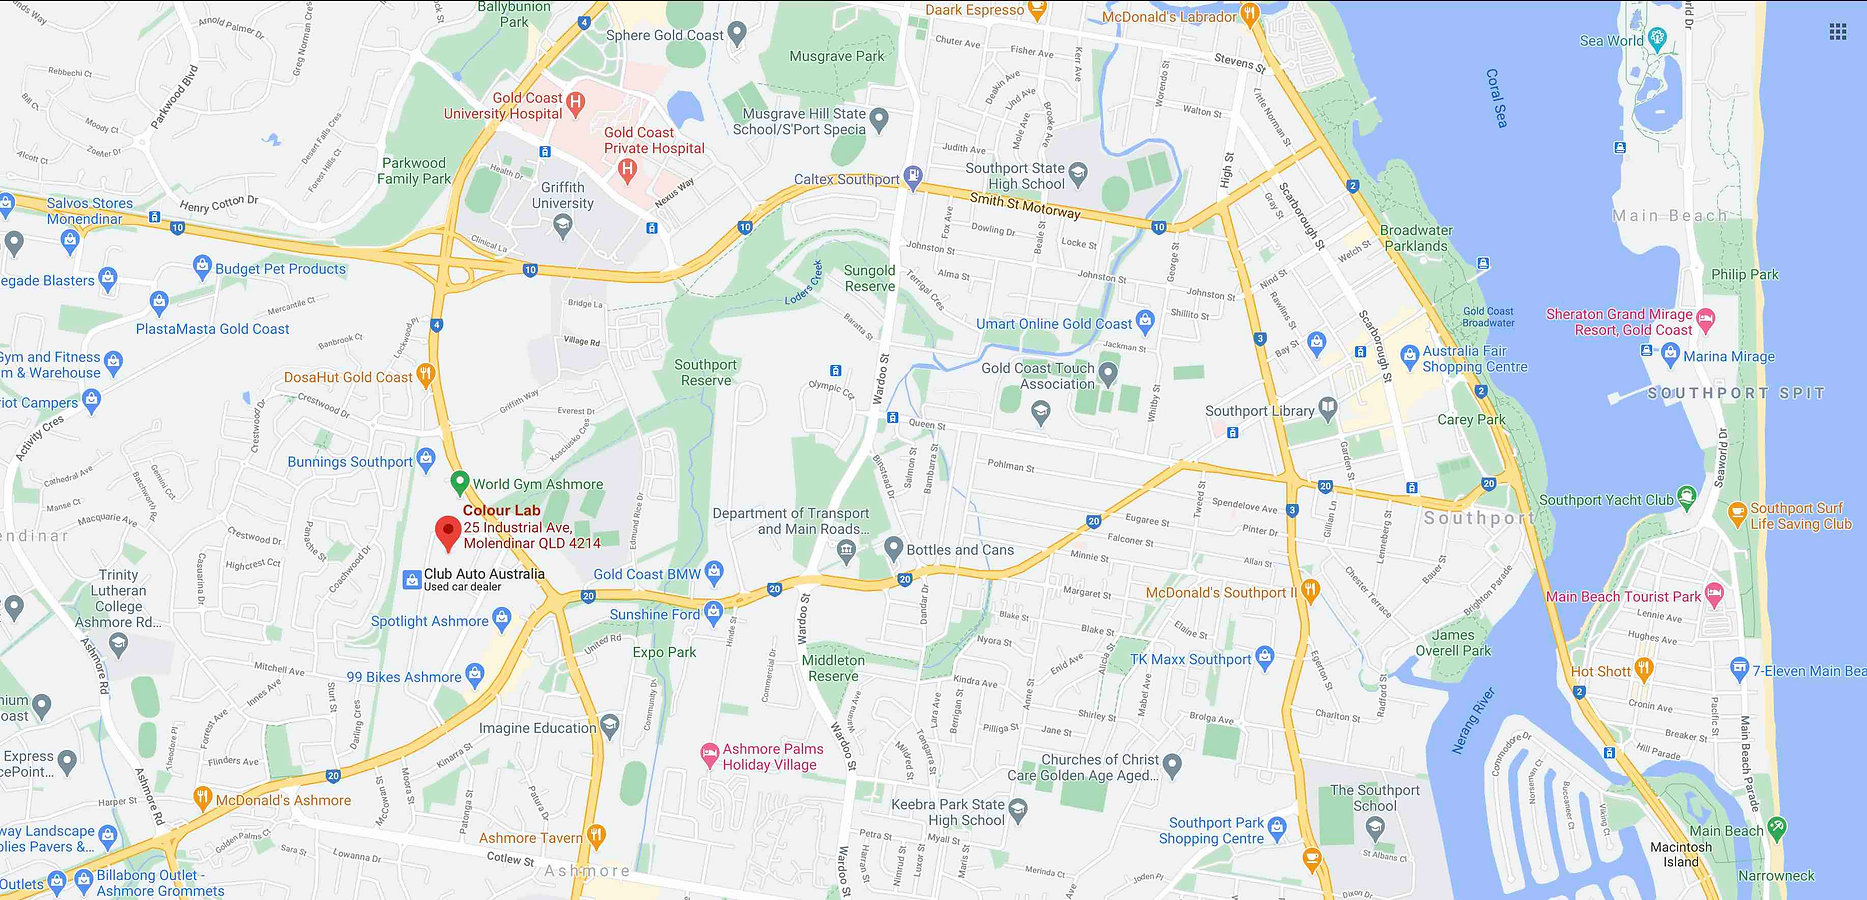 Colour Lab Map (Gold Coast).jpg